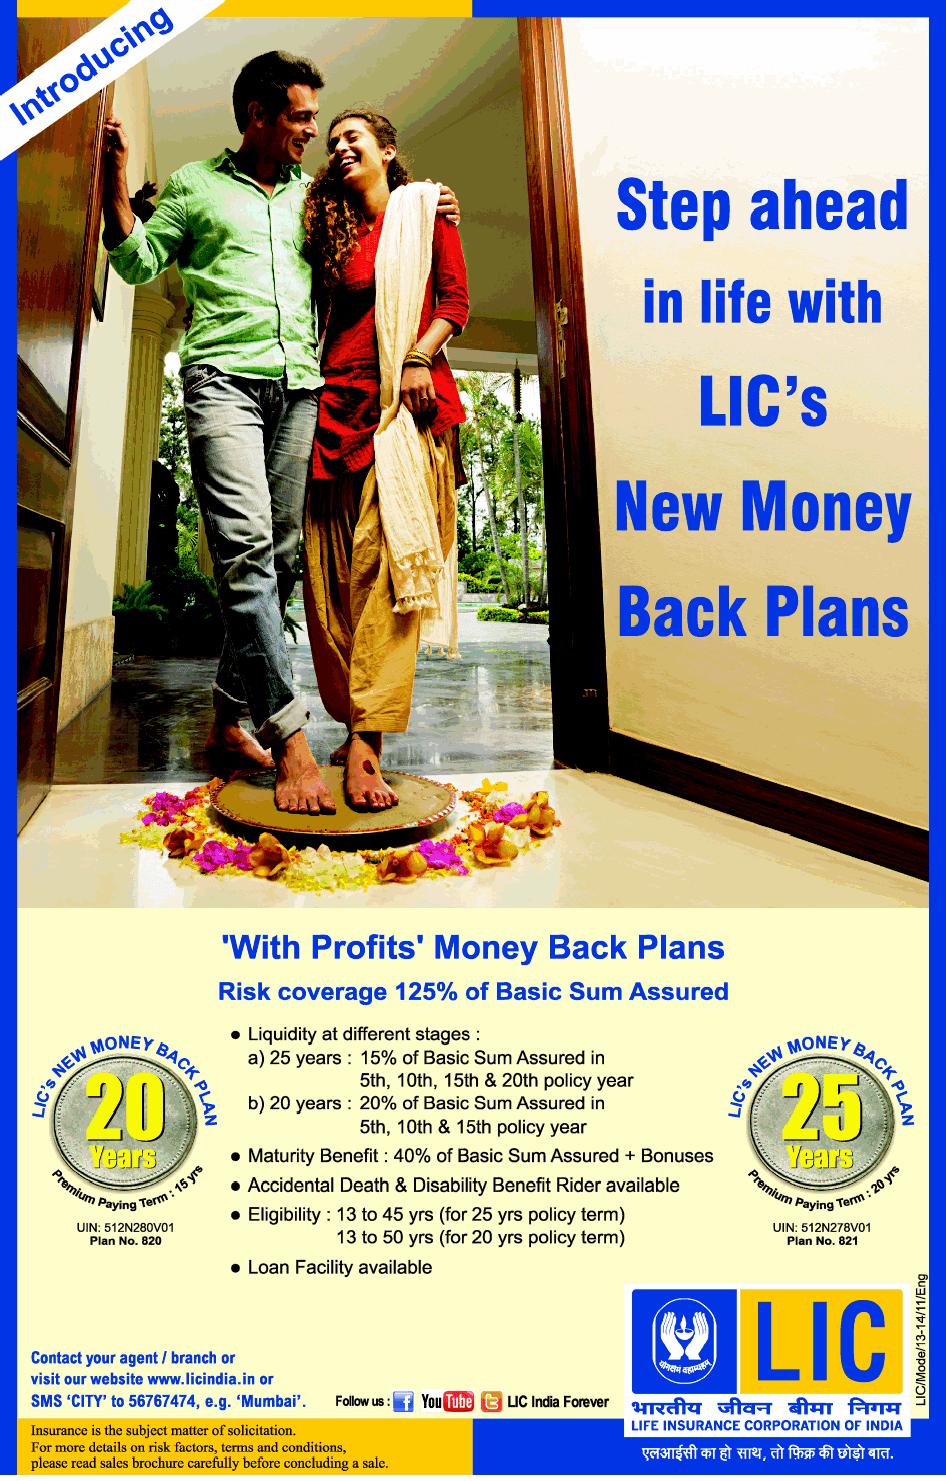 LIC Plans: New Money Back Plan - 20 Years